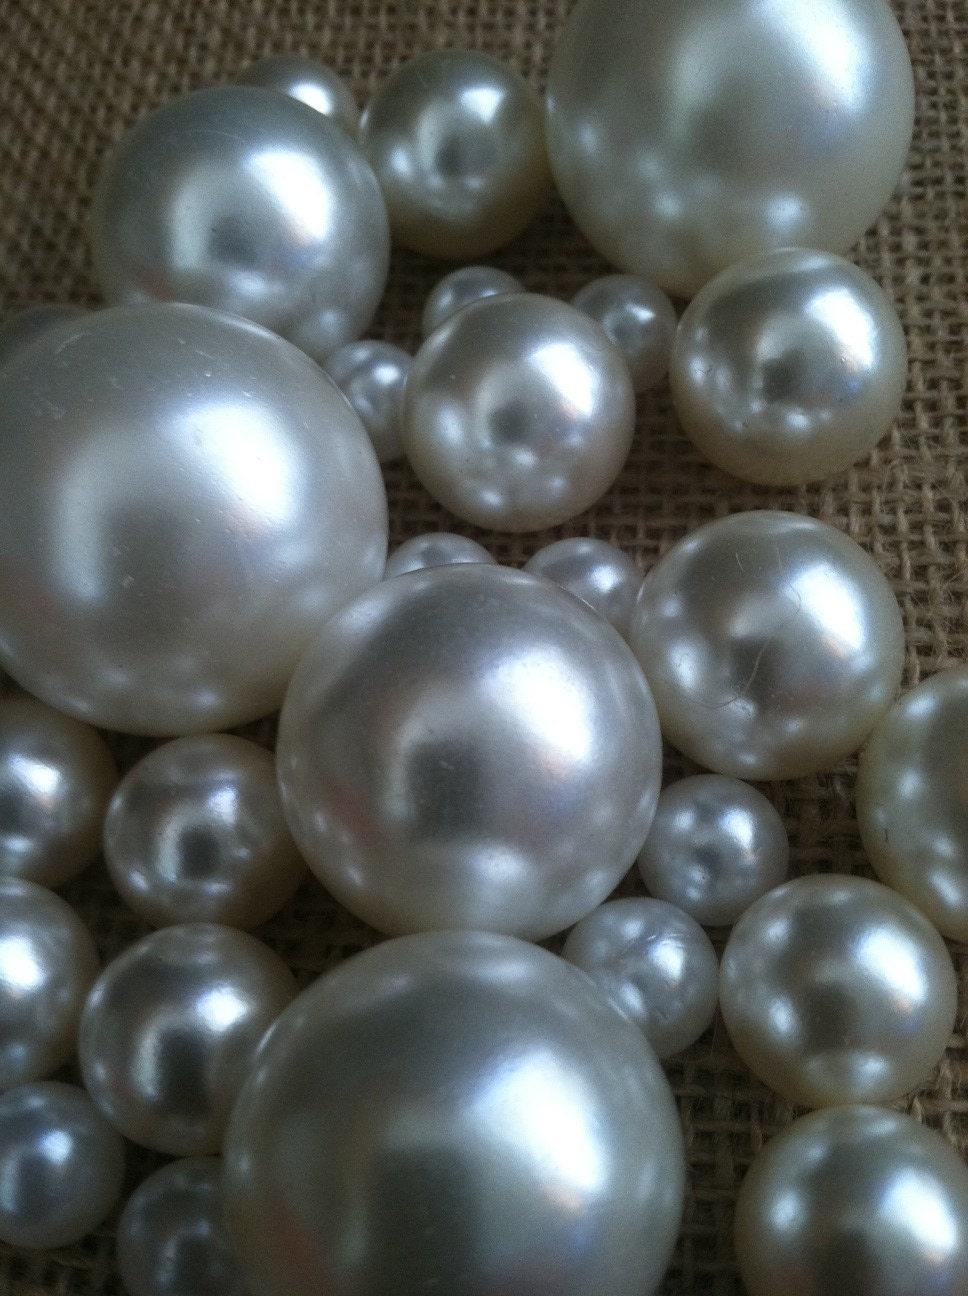 Bulk loose white pearls no holes3 4 5 6 7 8 10 14 18 24 30mm zoom reviewsmspy